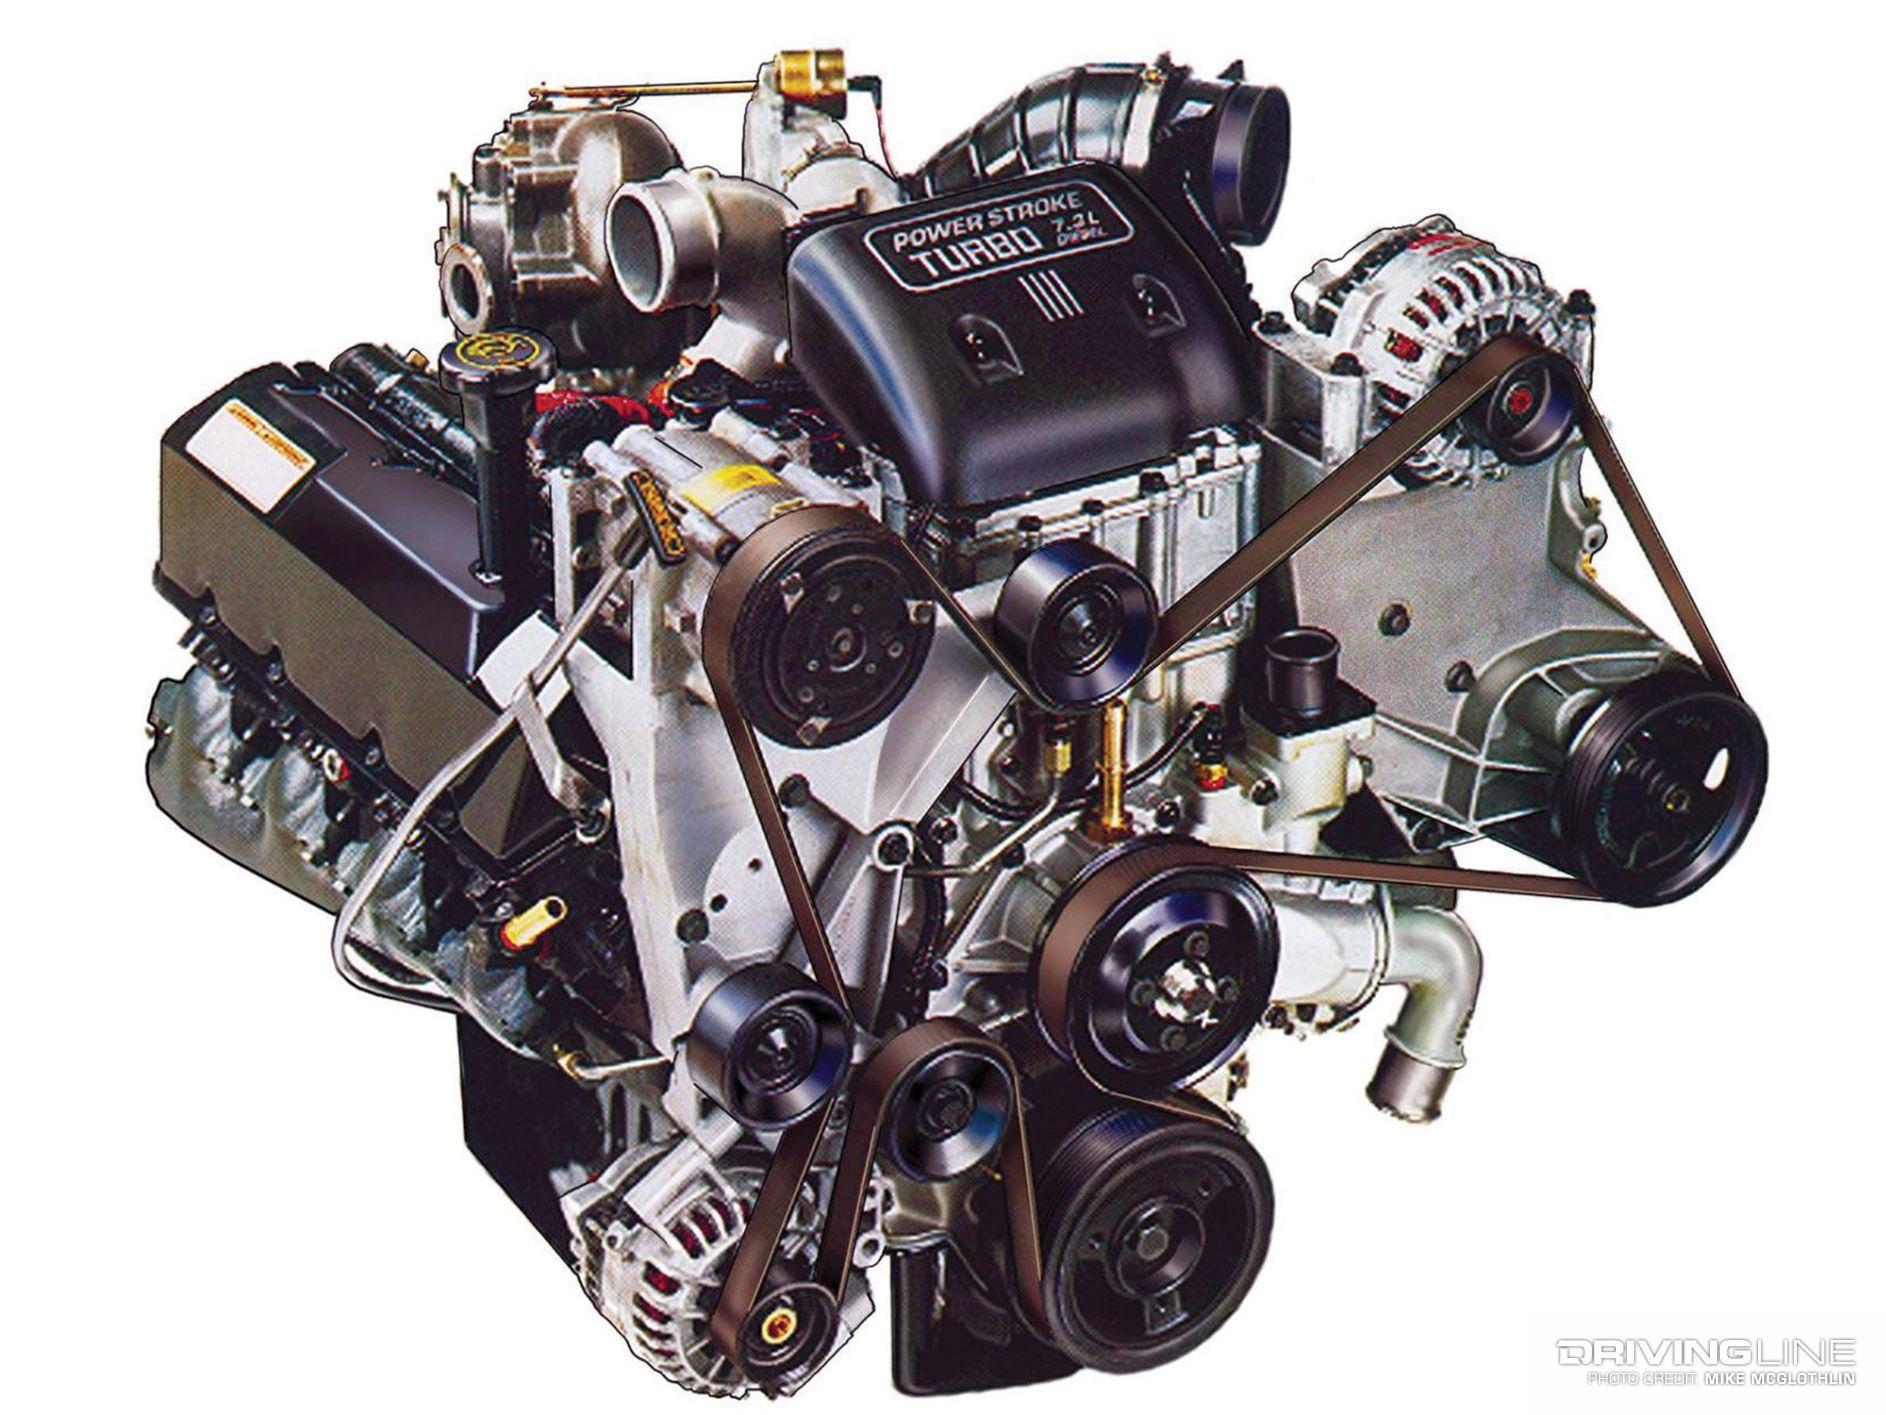 7 3l vs 6 0l which power stroke is really better drivingline 7 3l powerstroke repair 2001 7 3l powerstroke engine diagram [ 1886 x 1415 Pixel ]